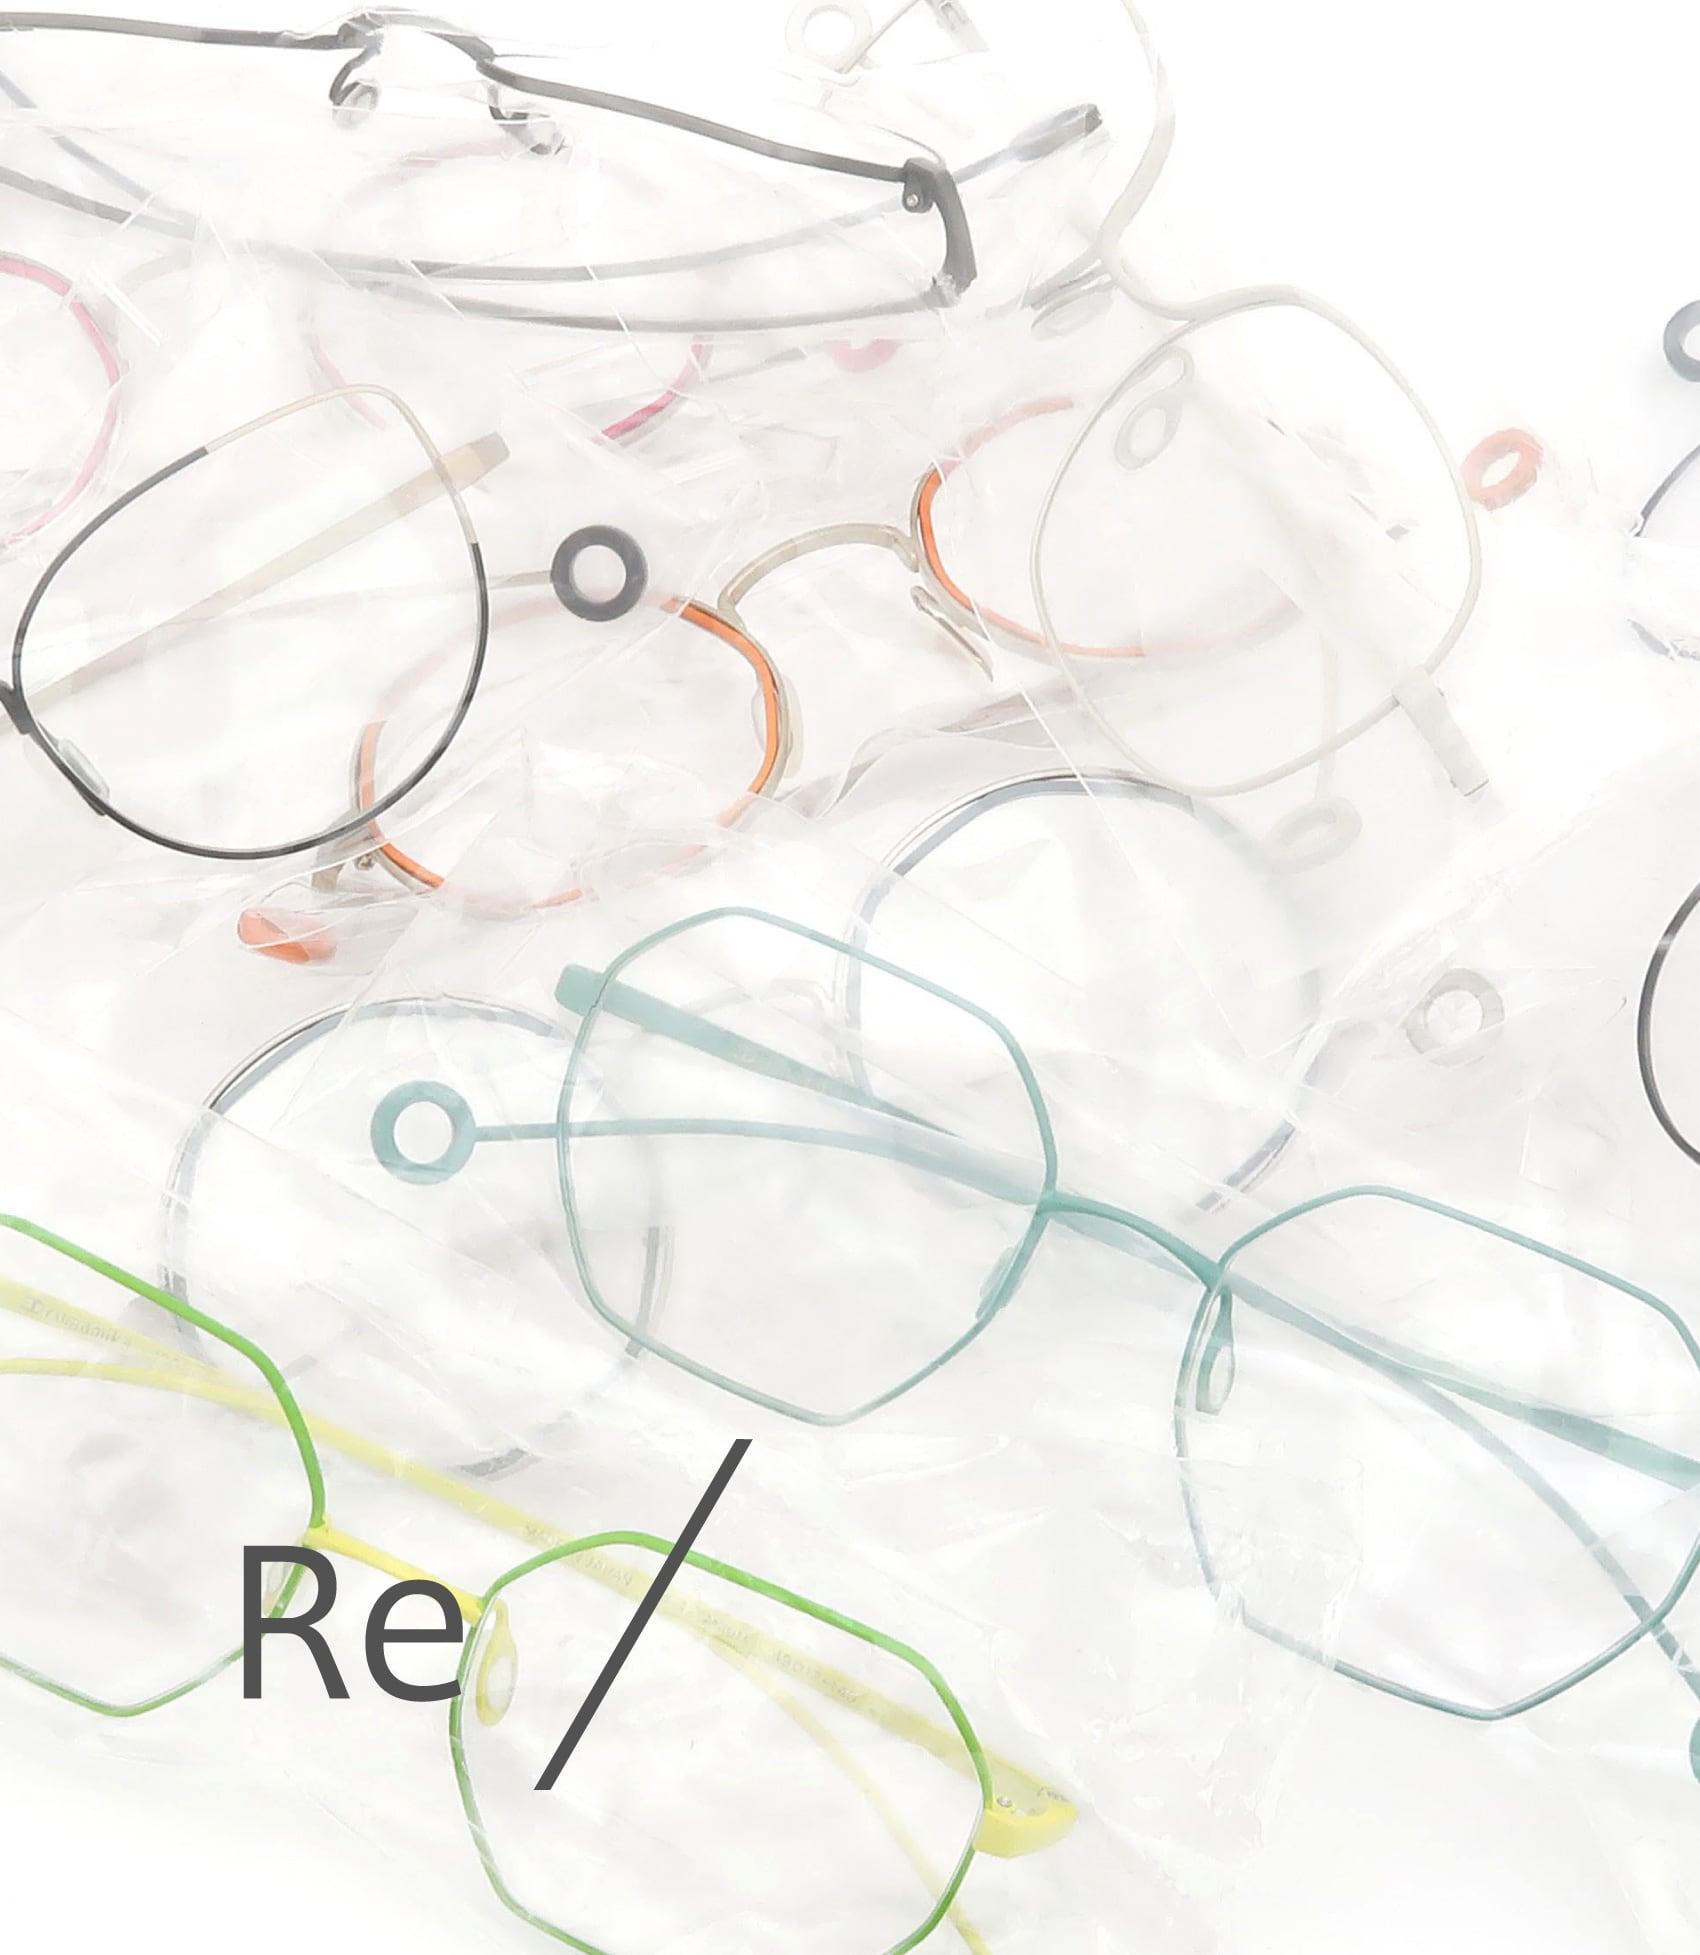 Re/Arumamika アップサイクリング コレクション